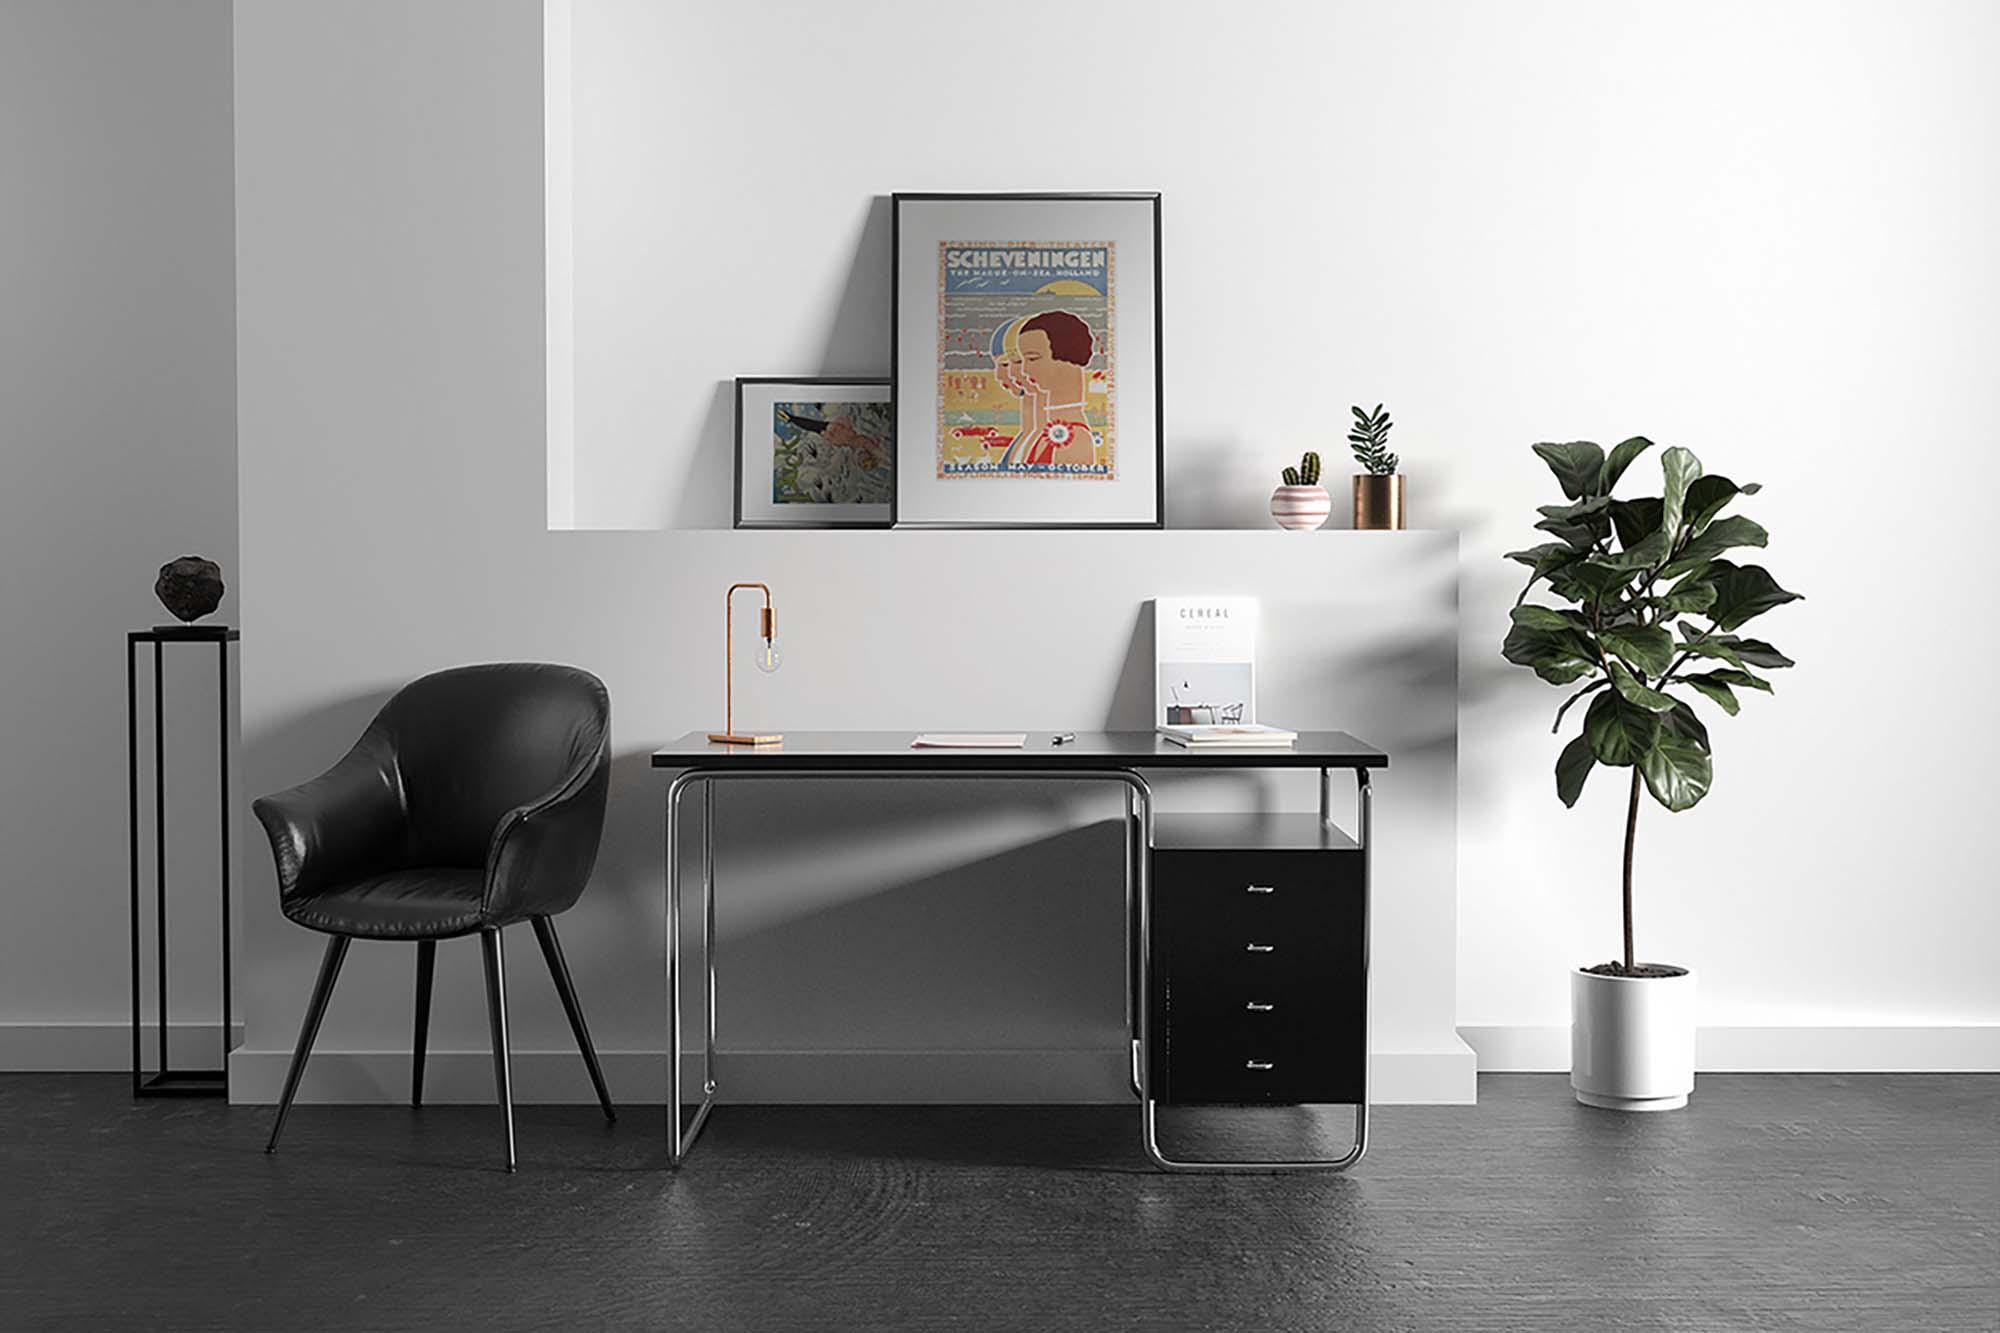 Workspace Poster Mockup